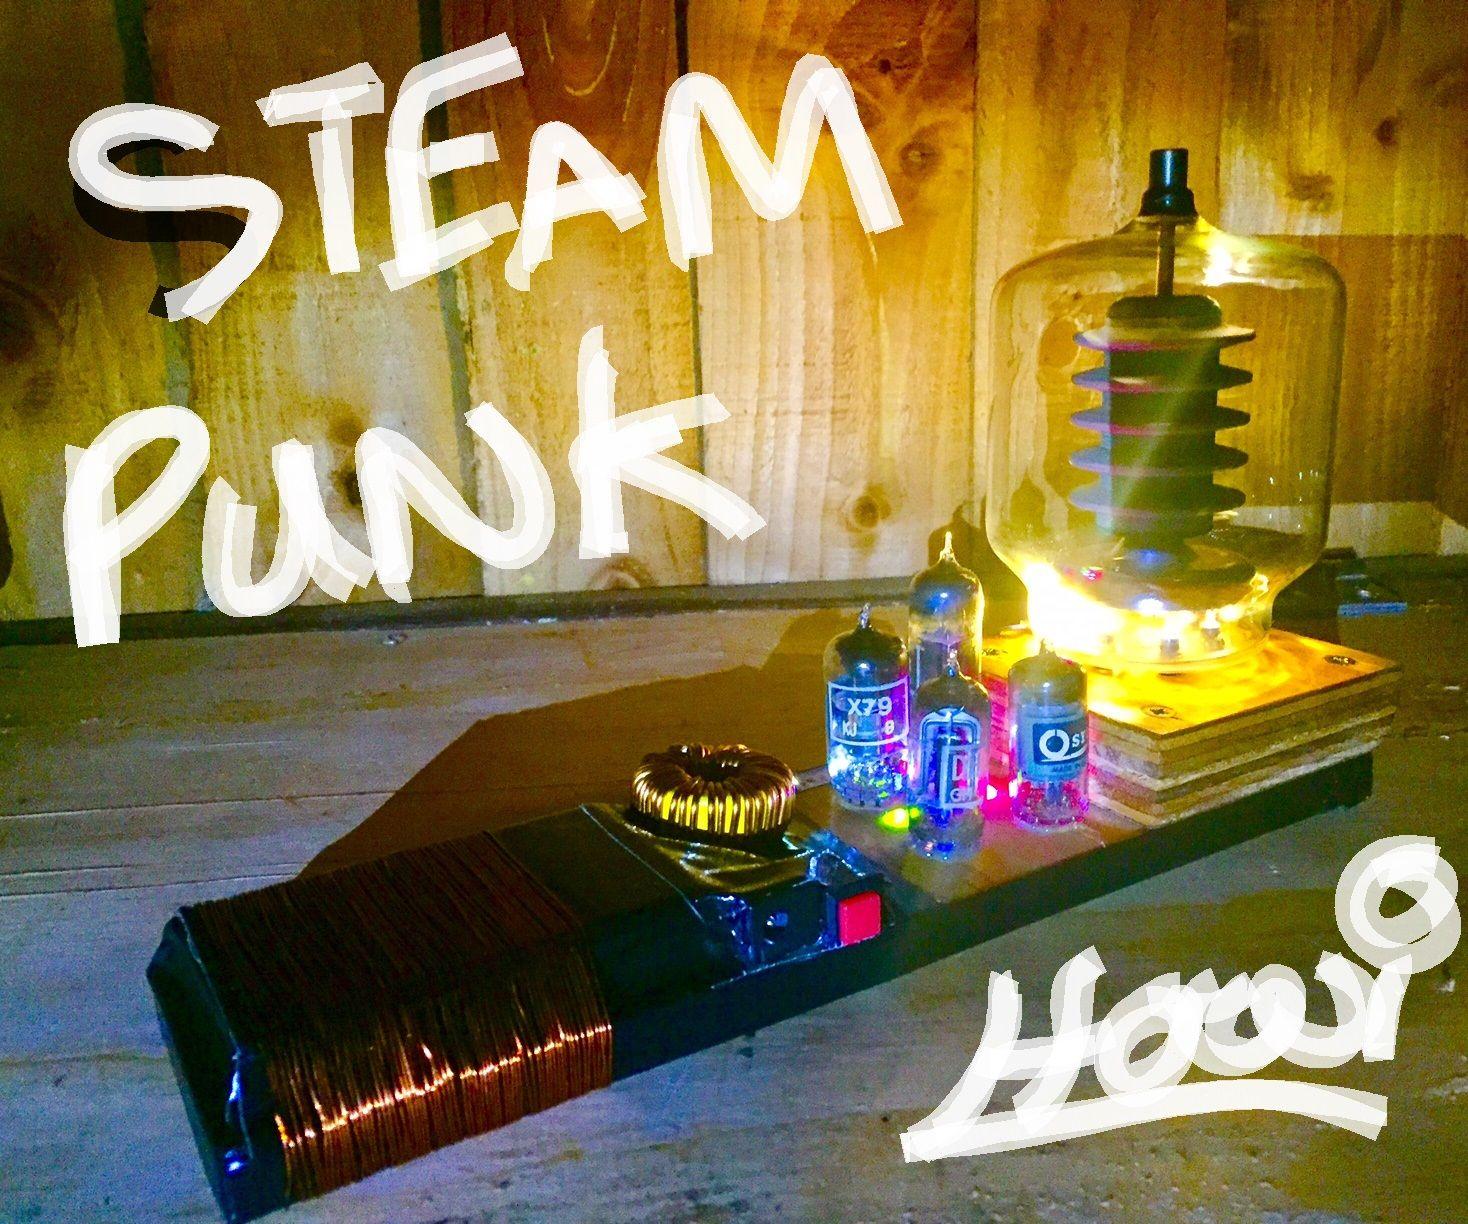 Beautiful Steam Punk Valve LED Lighting